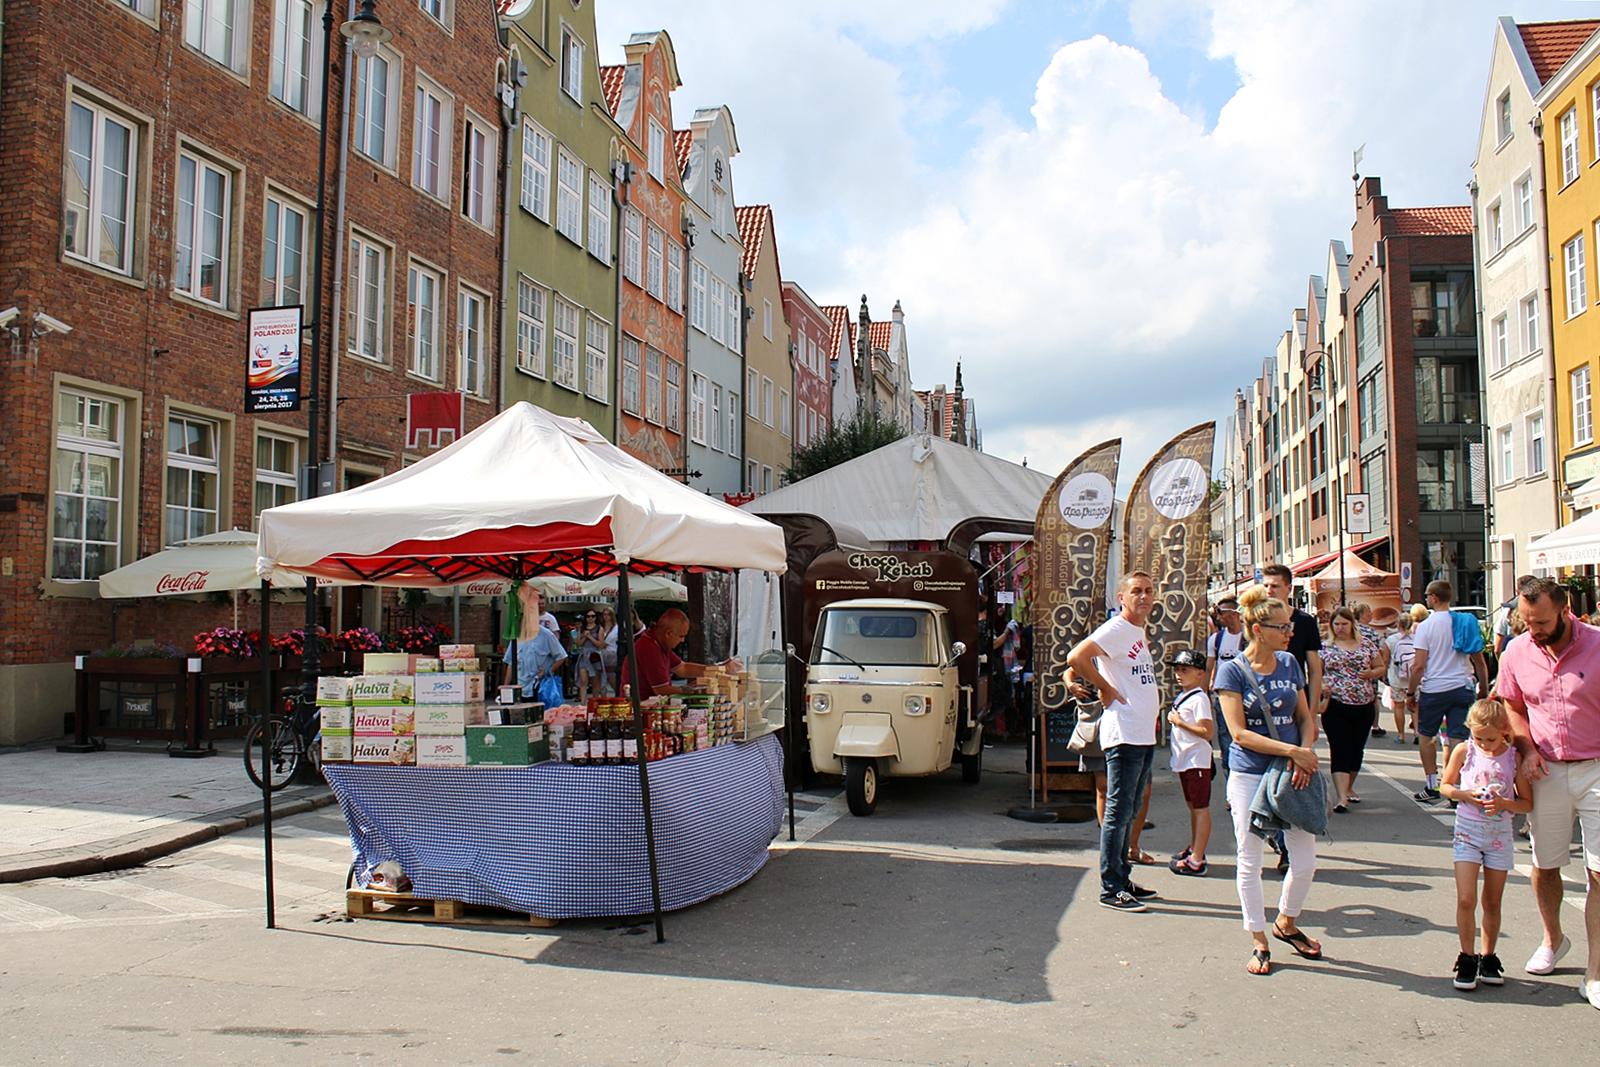 St. Dominic´s Fair en årlig marknad i Gdansk